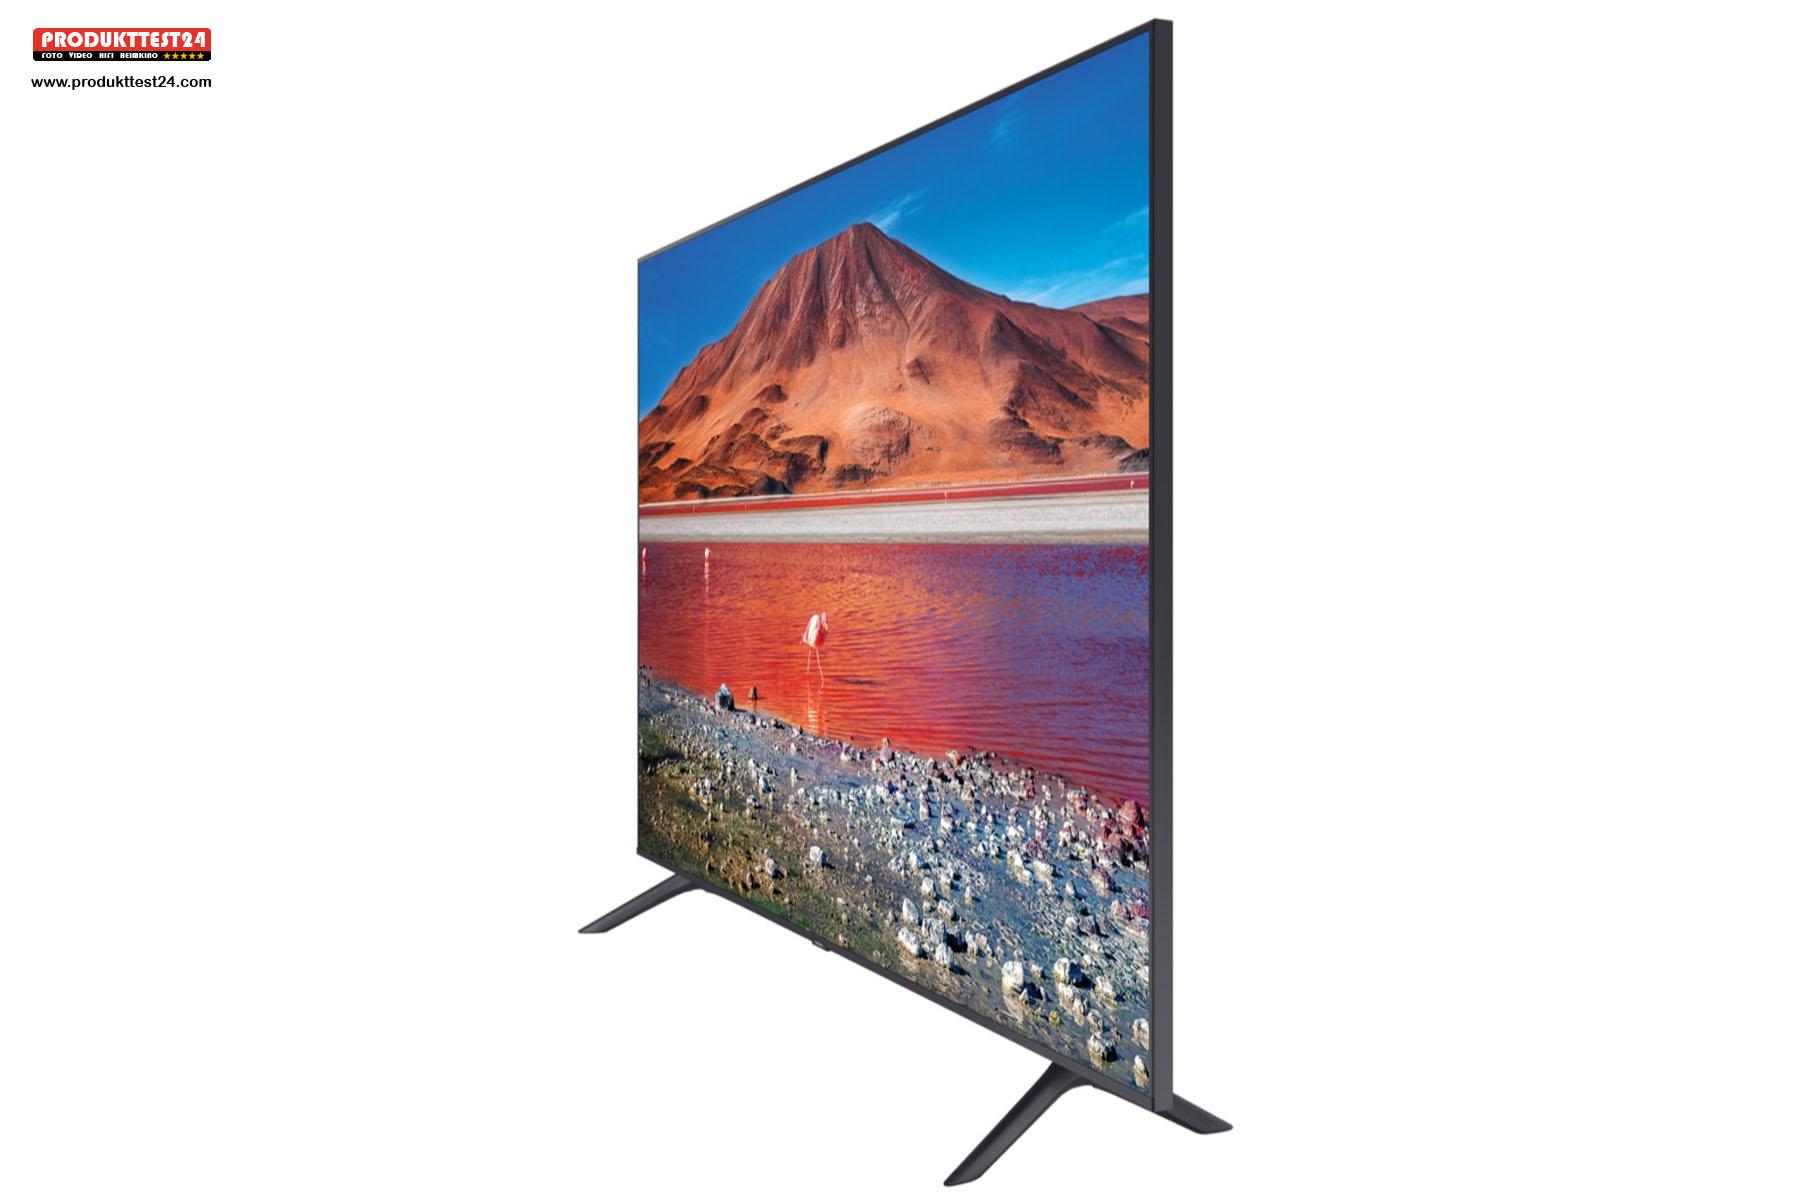 Samsung GU70TU7199 UHD 4K TV